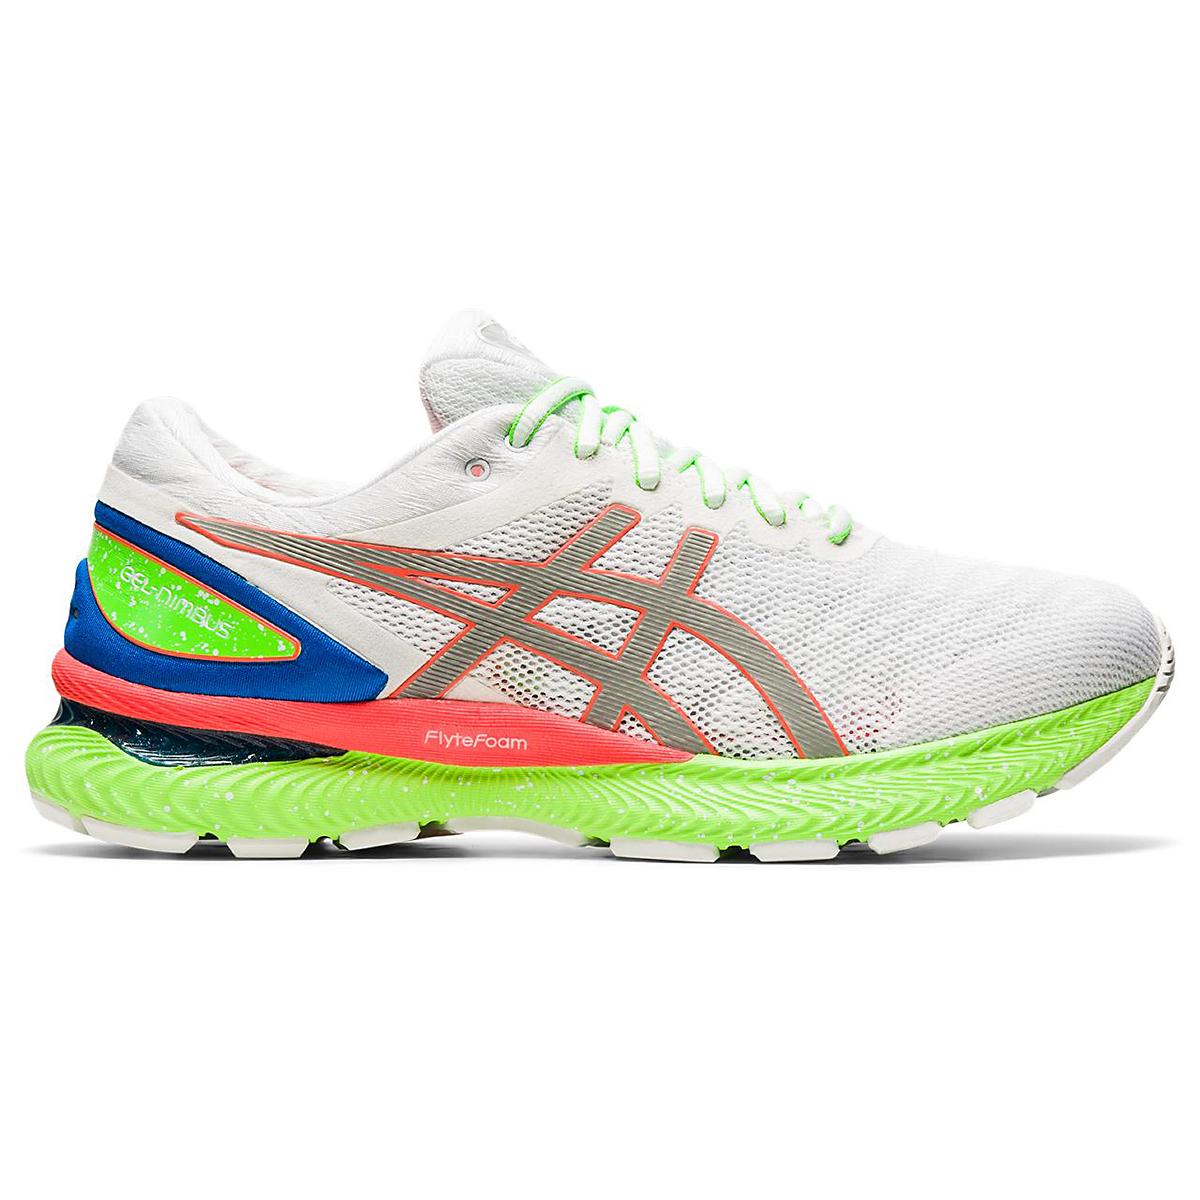 Men's Asics Gel-Nimbus 22 Running Shoe - Color: White/Sunrise Red - Size: 6 - Width: Regular, White/Sunrise Red, large, image 1